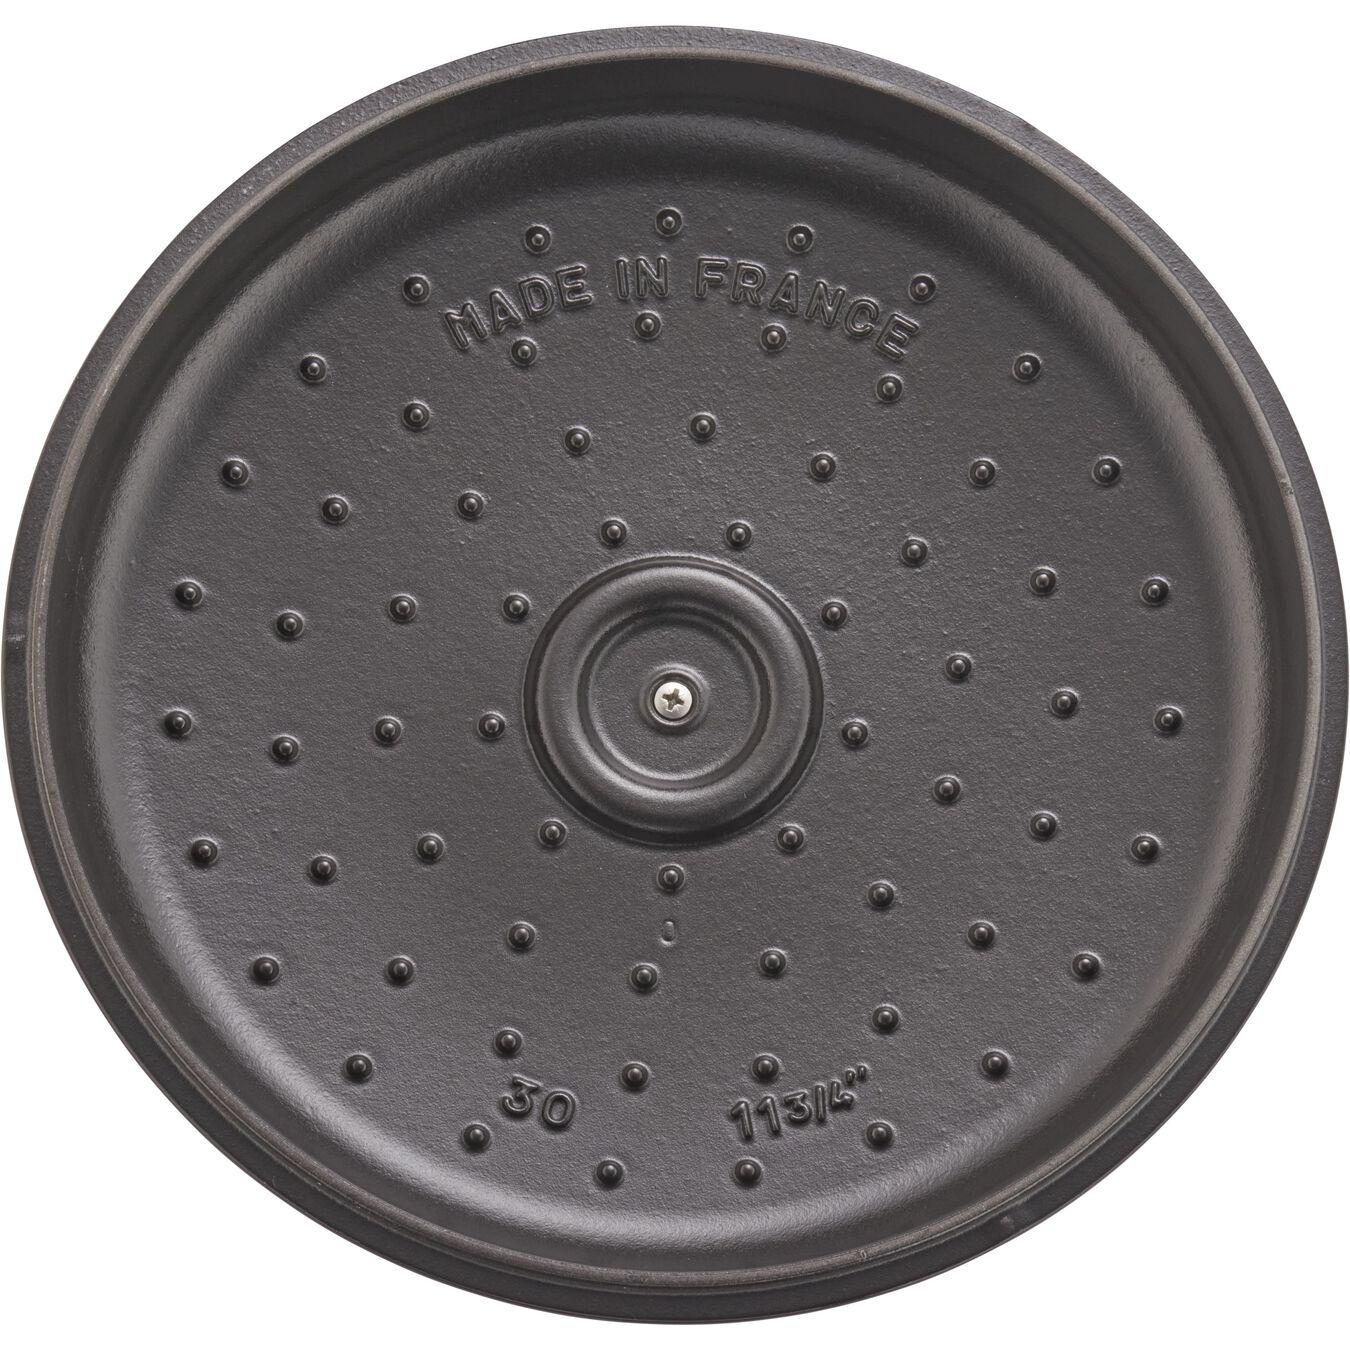 3,5 l Cast iron round Braisière, Grenadine-Red,,large 5